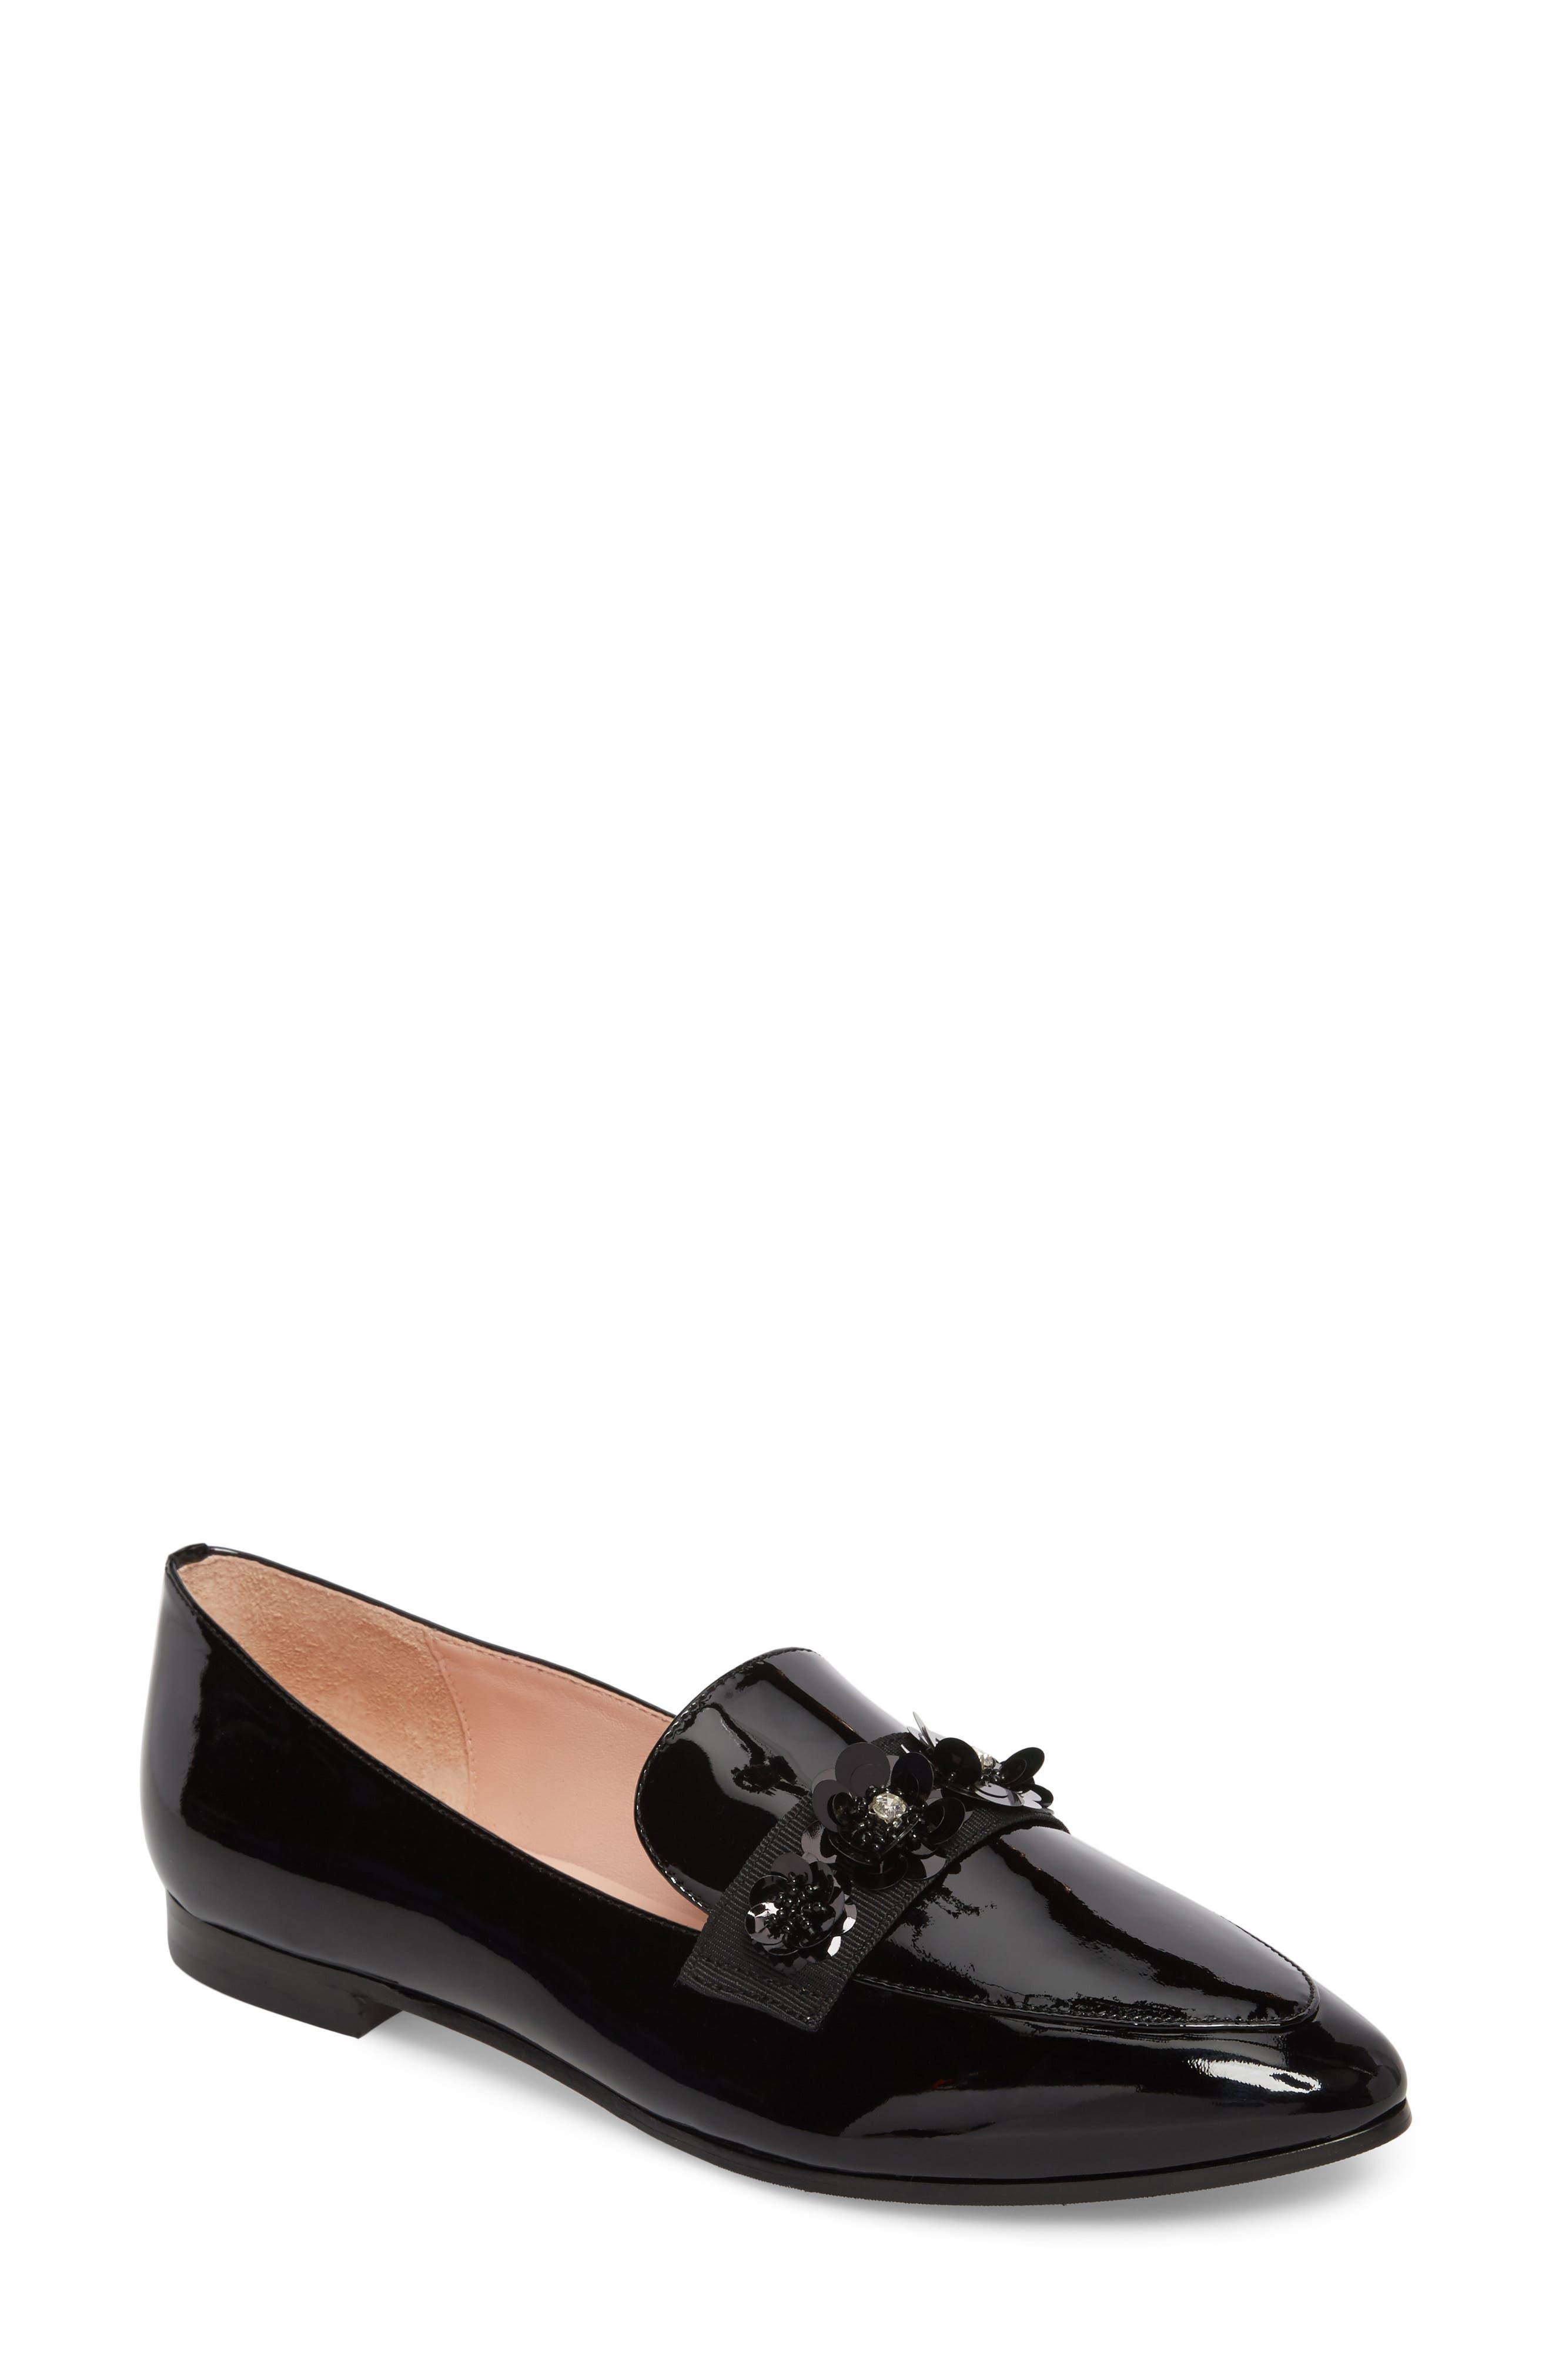 Main Image - kate spade new york cleo embellished loafer (Women)